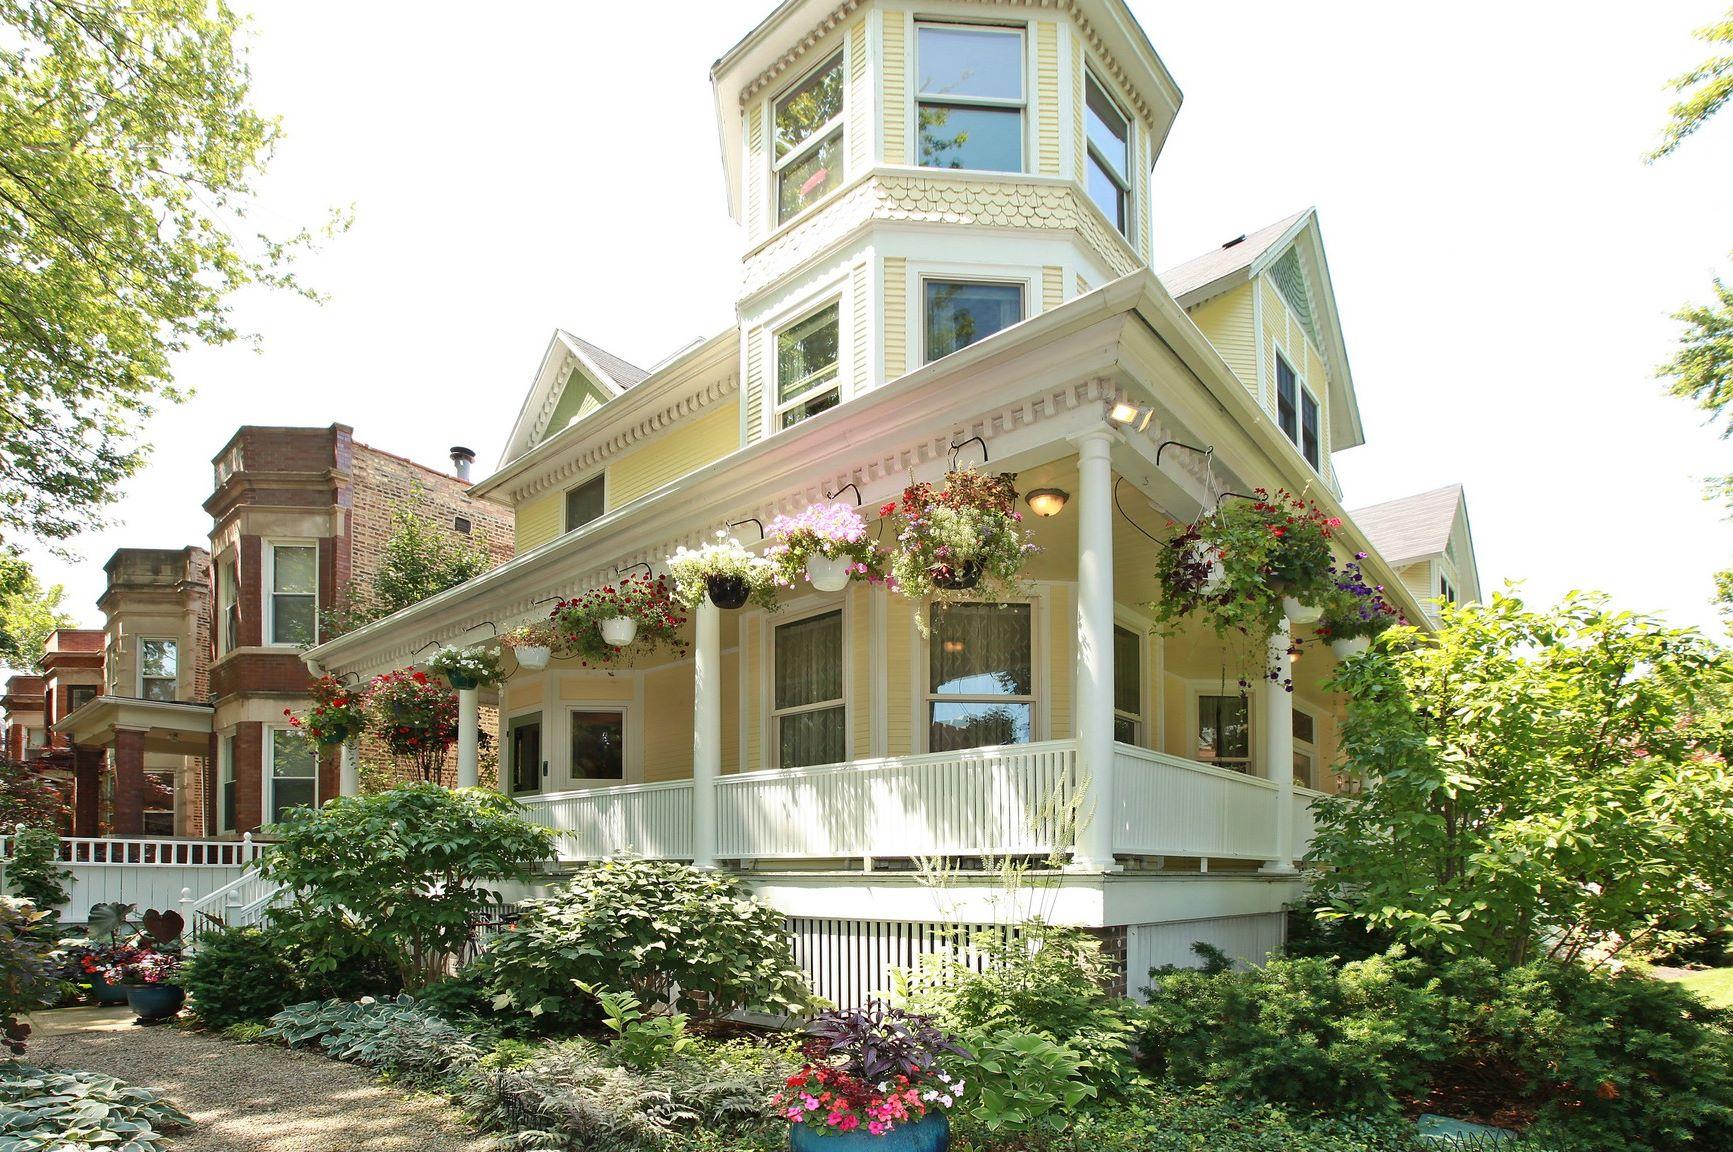 Nhà ở một gia đình vì Bán tại One of a Kind Lakeview Victorian Masterpiece! 1904 W Patterson Avenue Lakeview, Chicago, Illinois, 60613 Hoa Kỳ